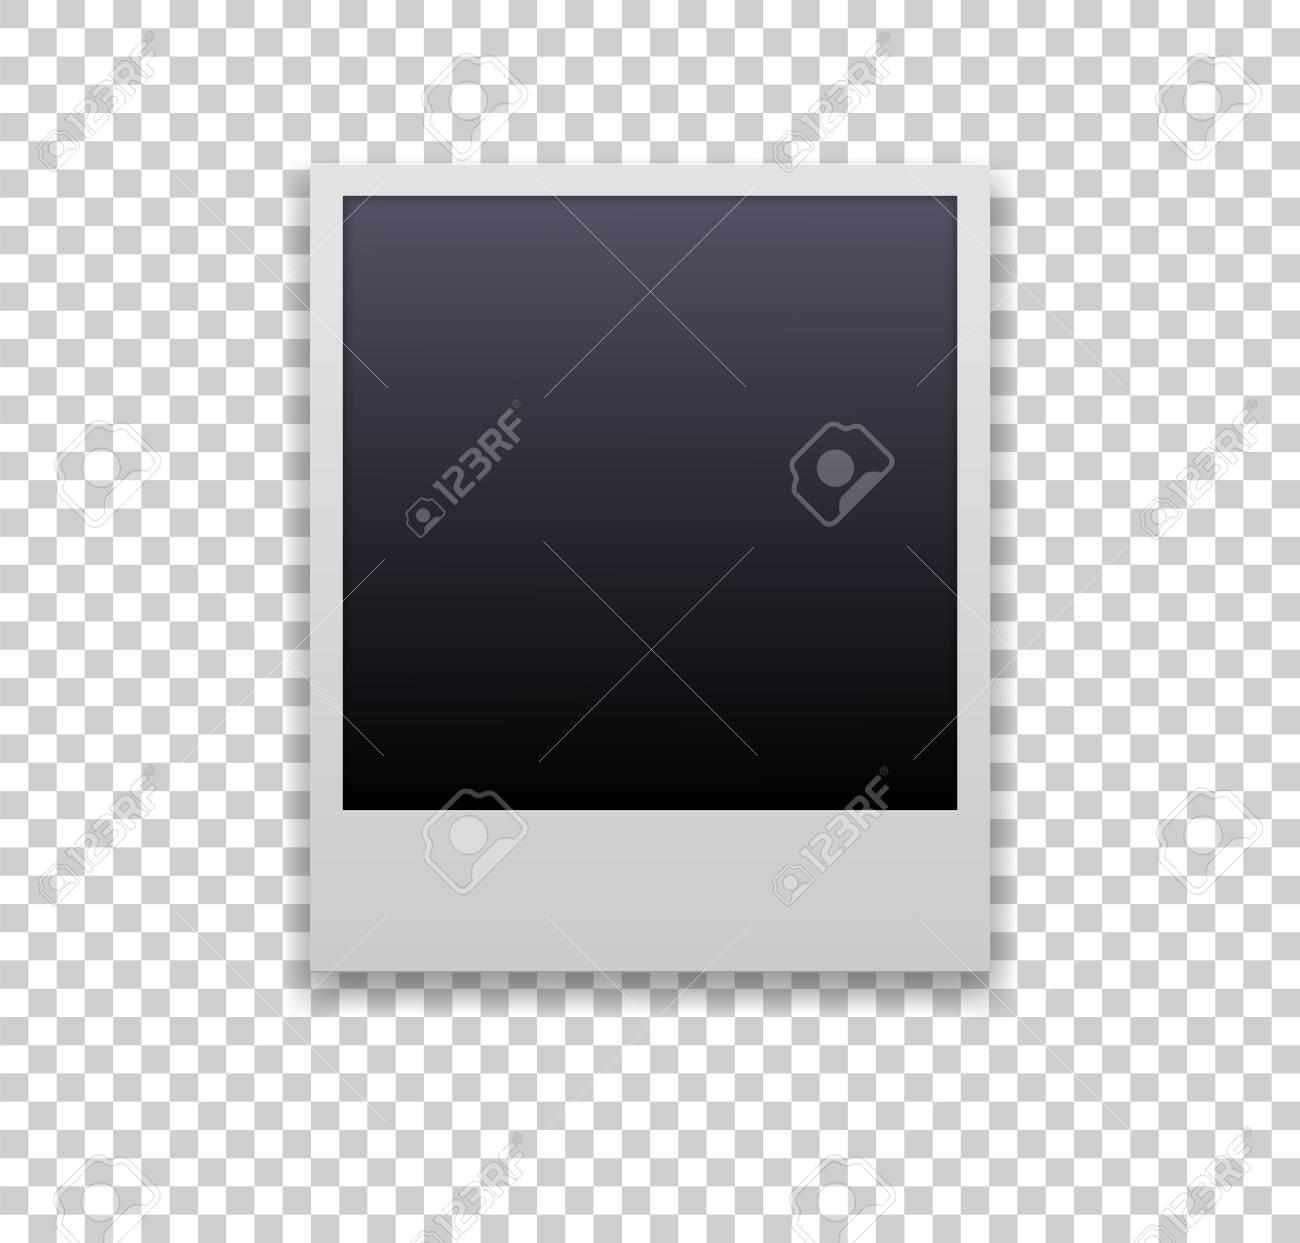 frame. Editable with transparent background. album element - 125841516